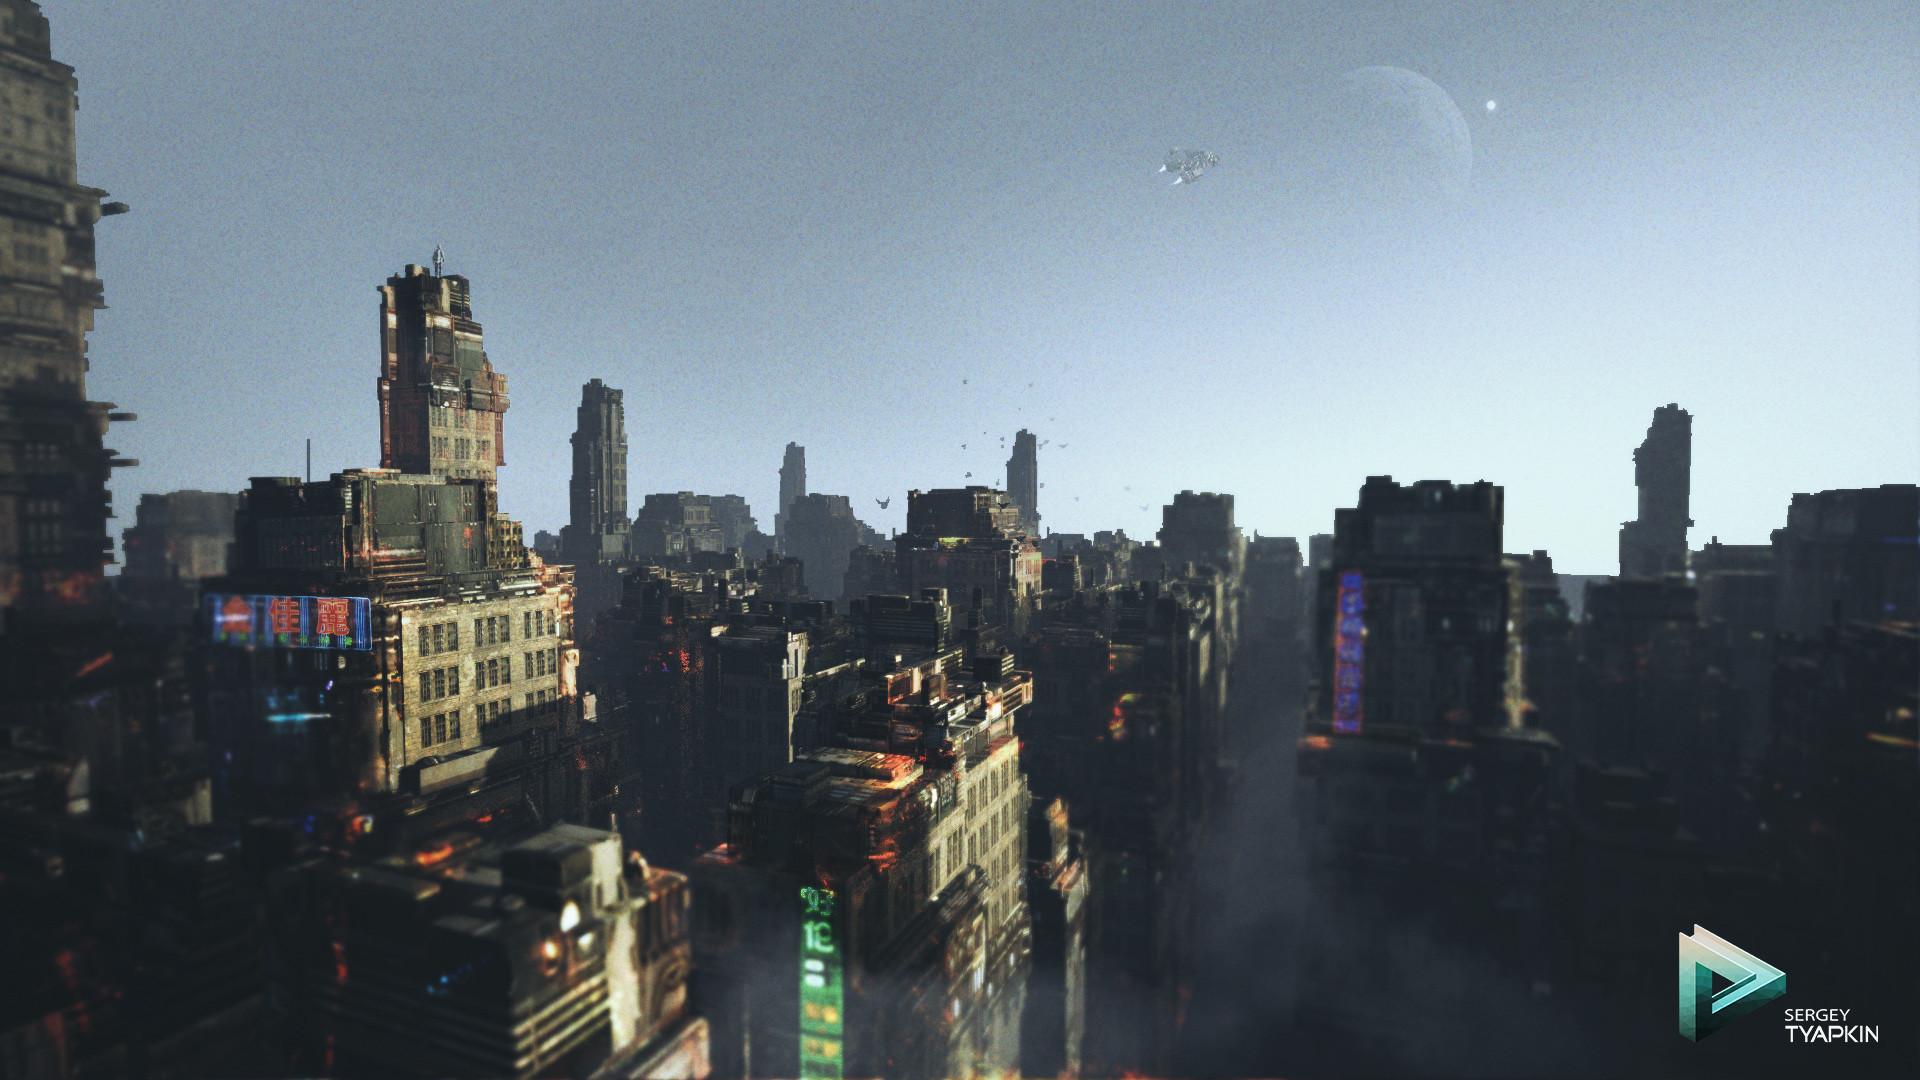 Sergey tyapkin scifi city concept scene 02